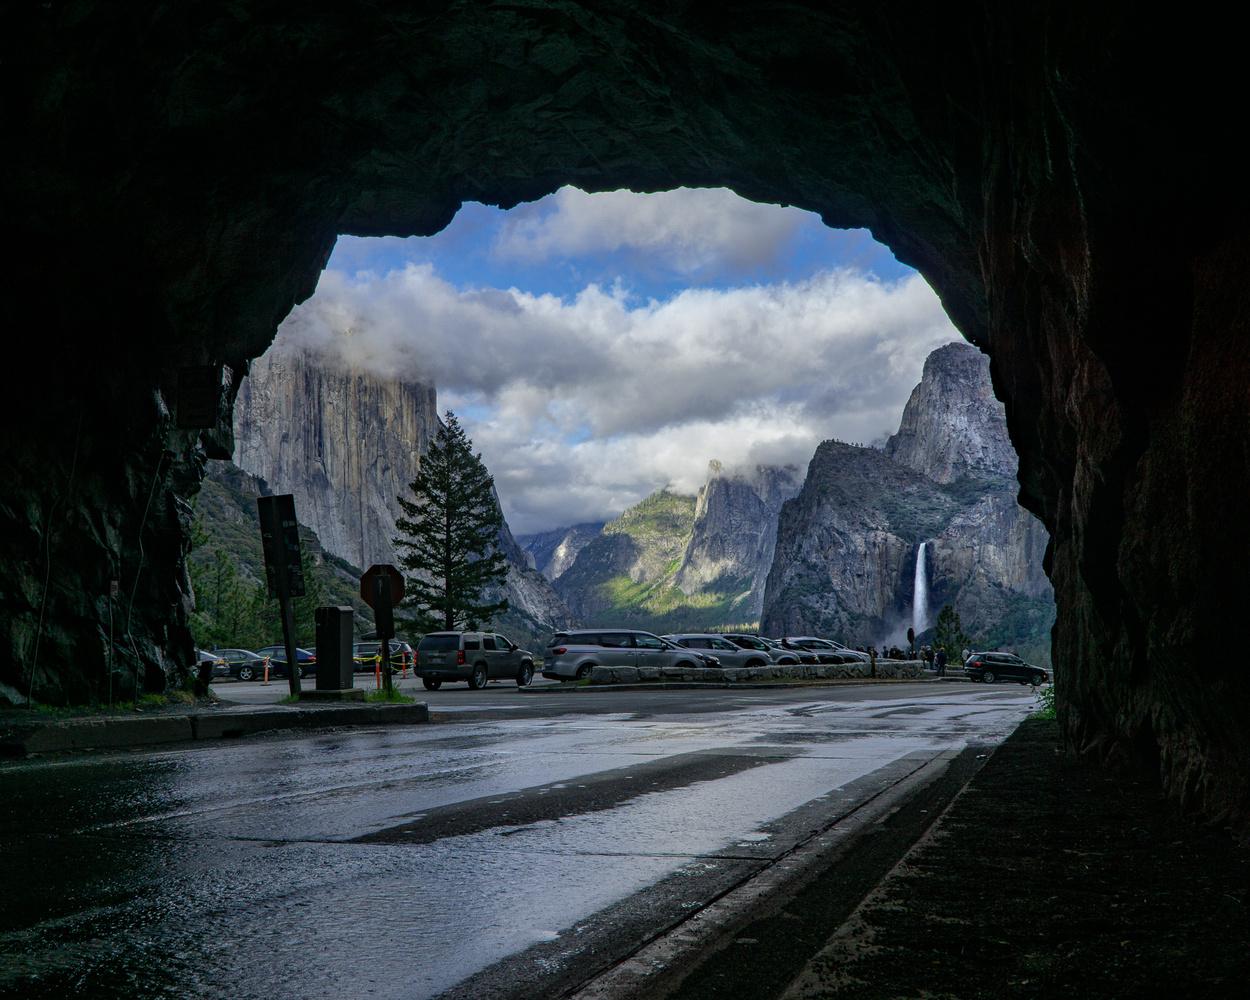 Tunnel View - Yosemite by John Bessette